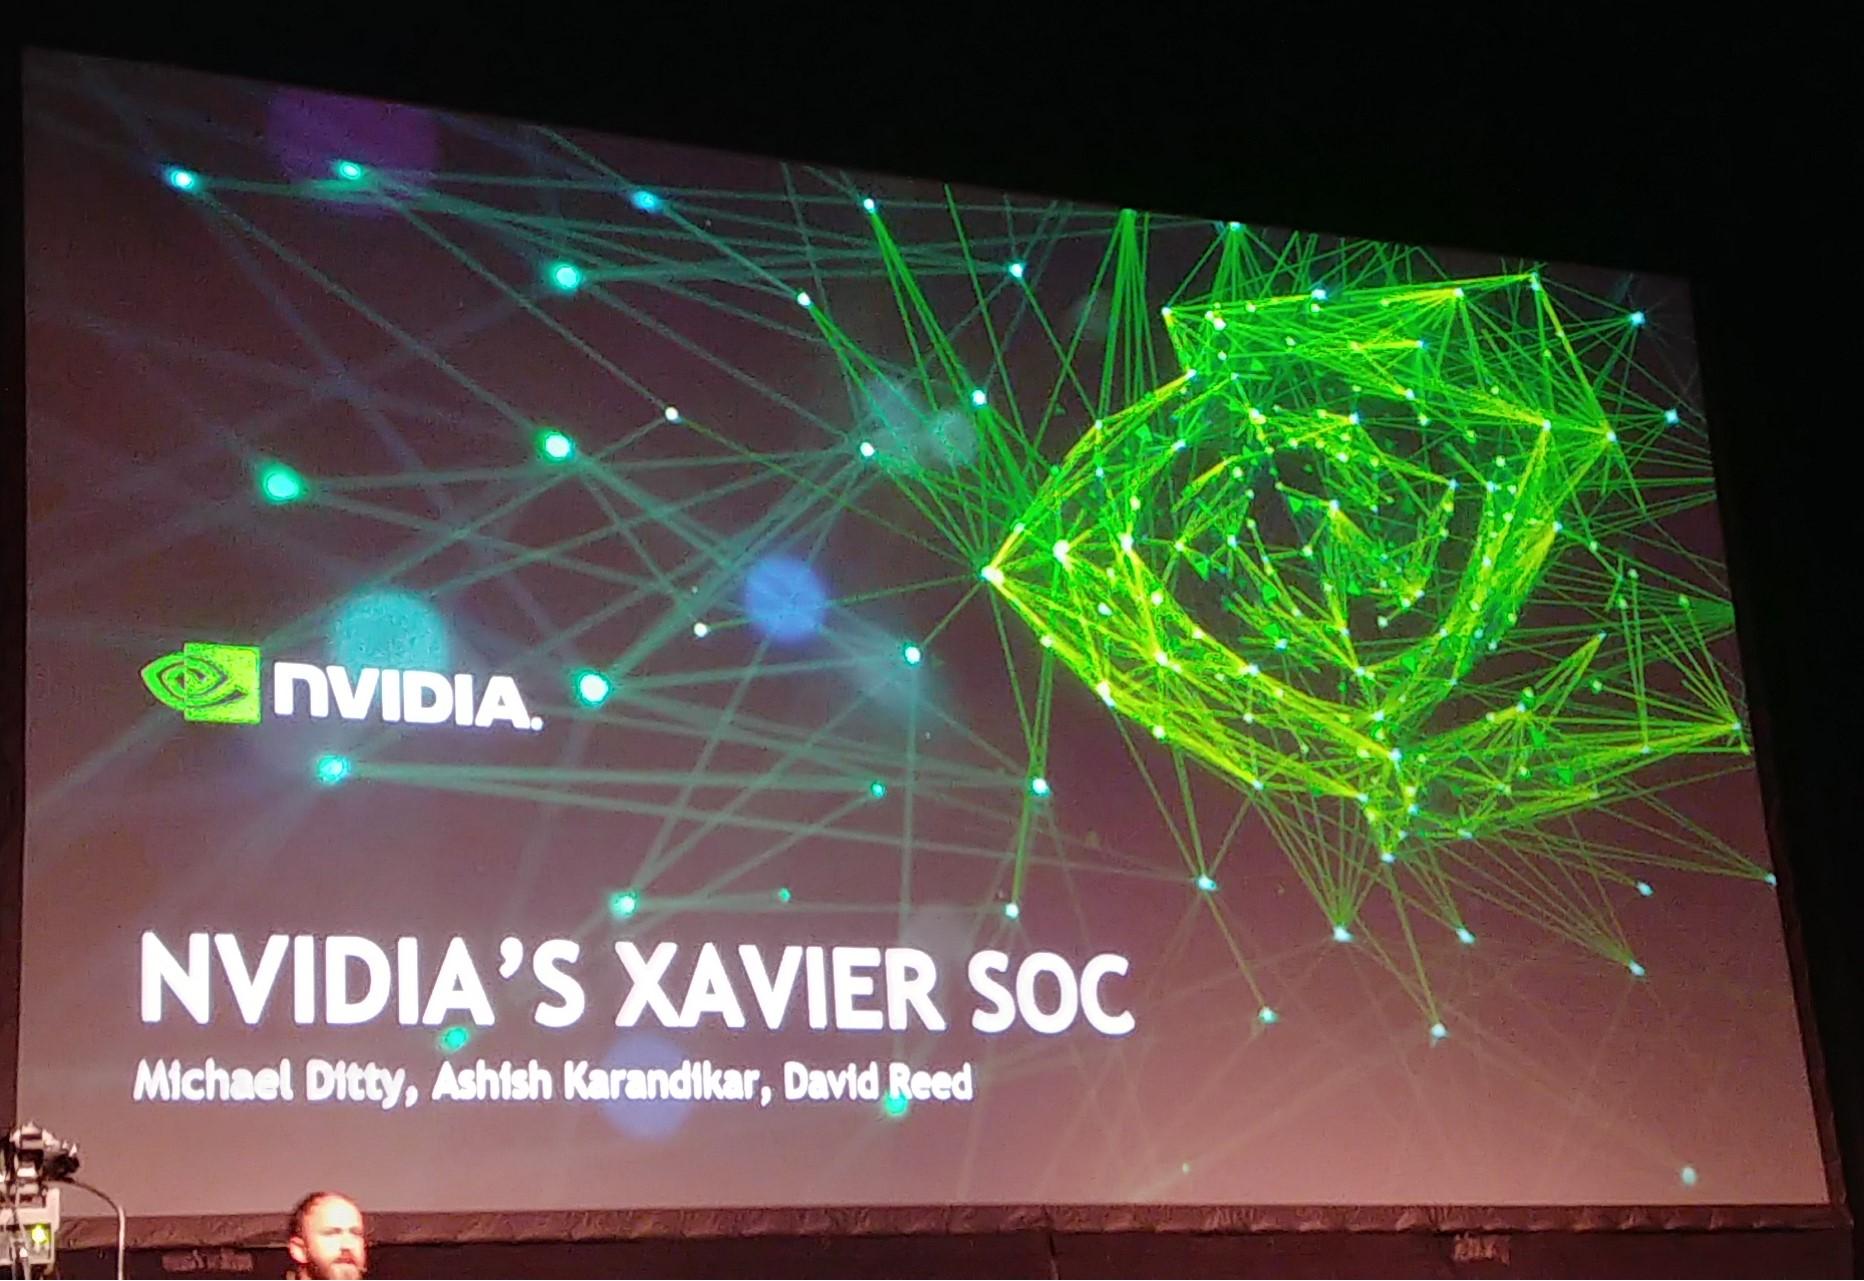 nvidia presents improved xavier soc for autonomous